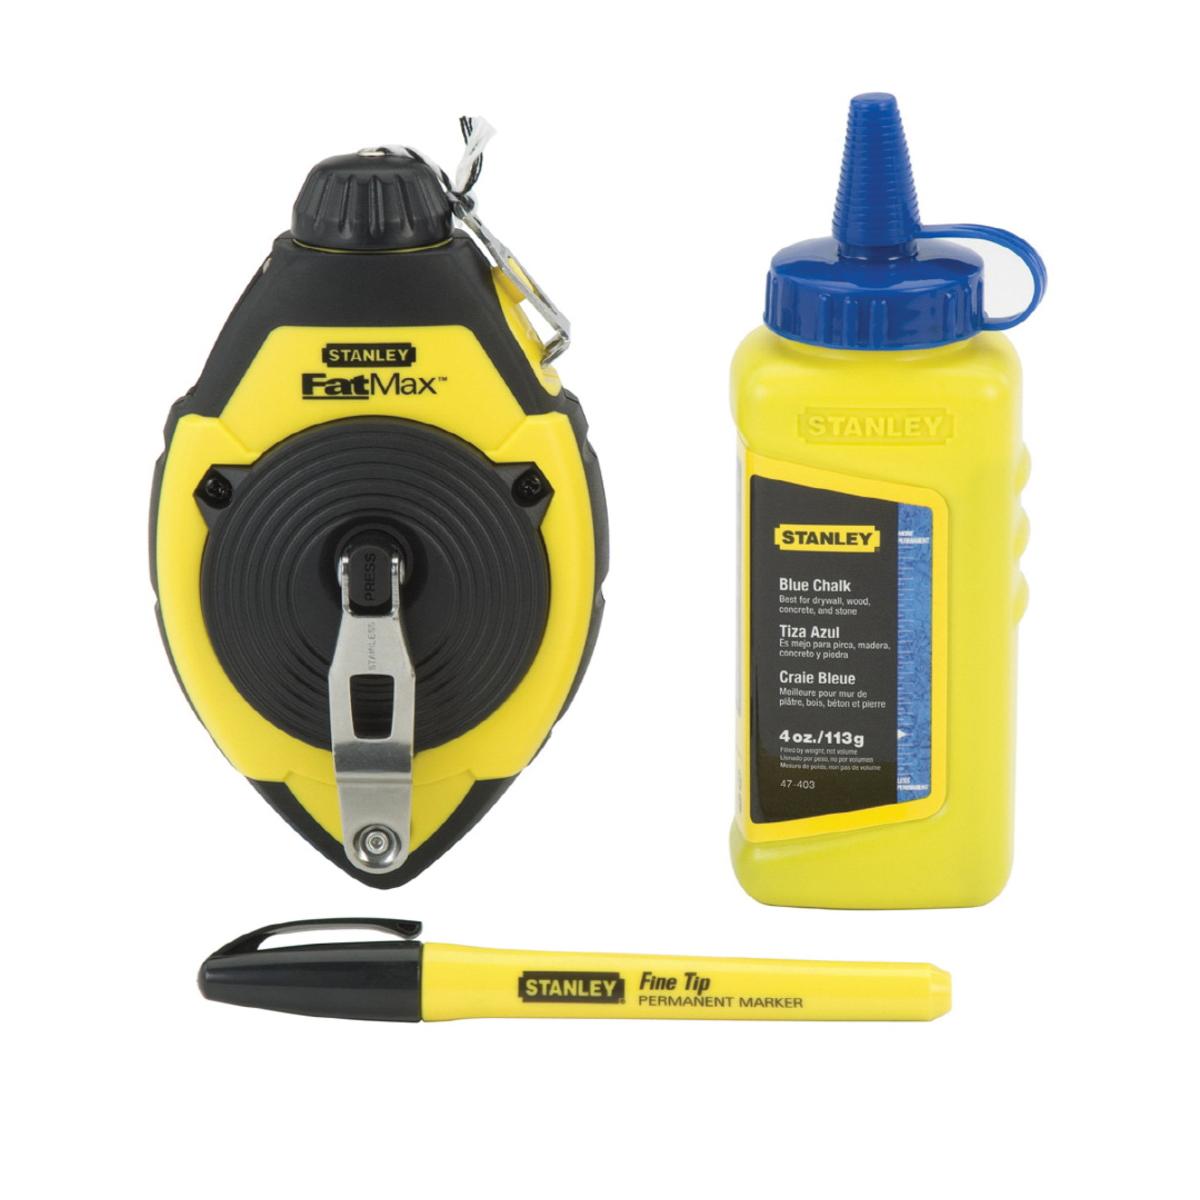 Stanley® FatMax® Xtreme™ 47-480 Chalk Line Reel, 100 ft L Polymer Line, 4 oz Chalk, Sliding Side Door, Folding Recessed Plastic Crank Handle